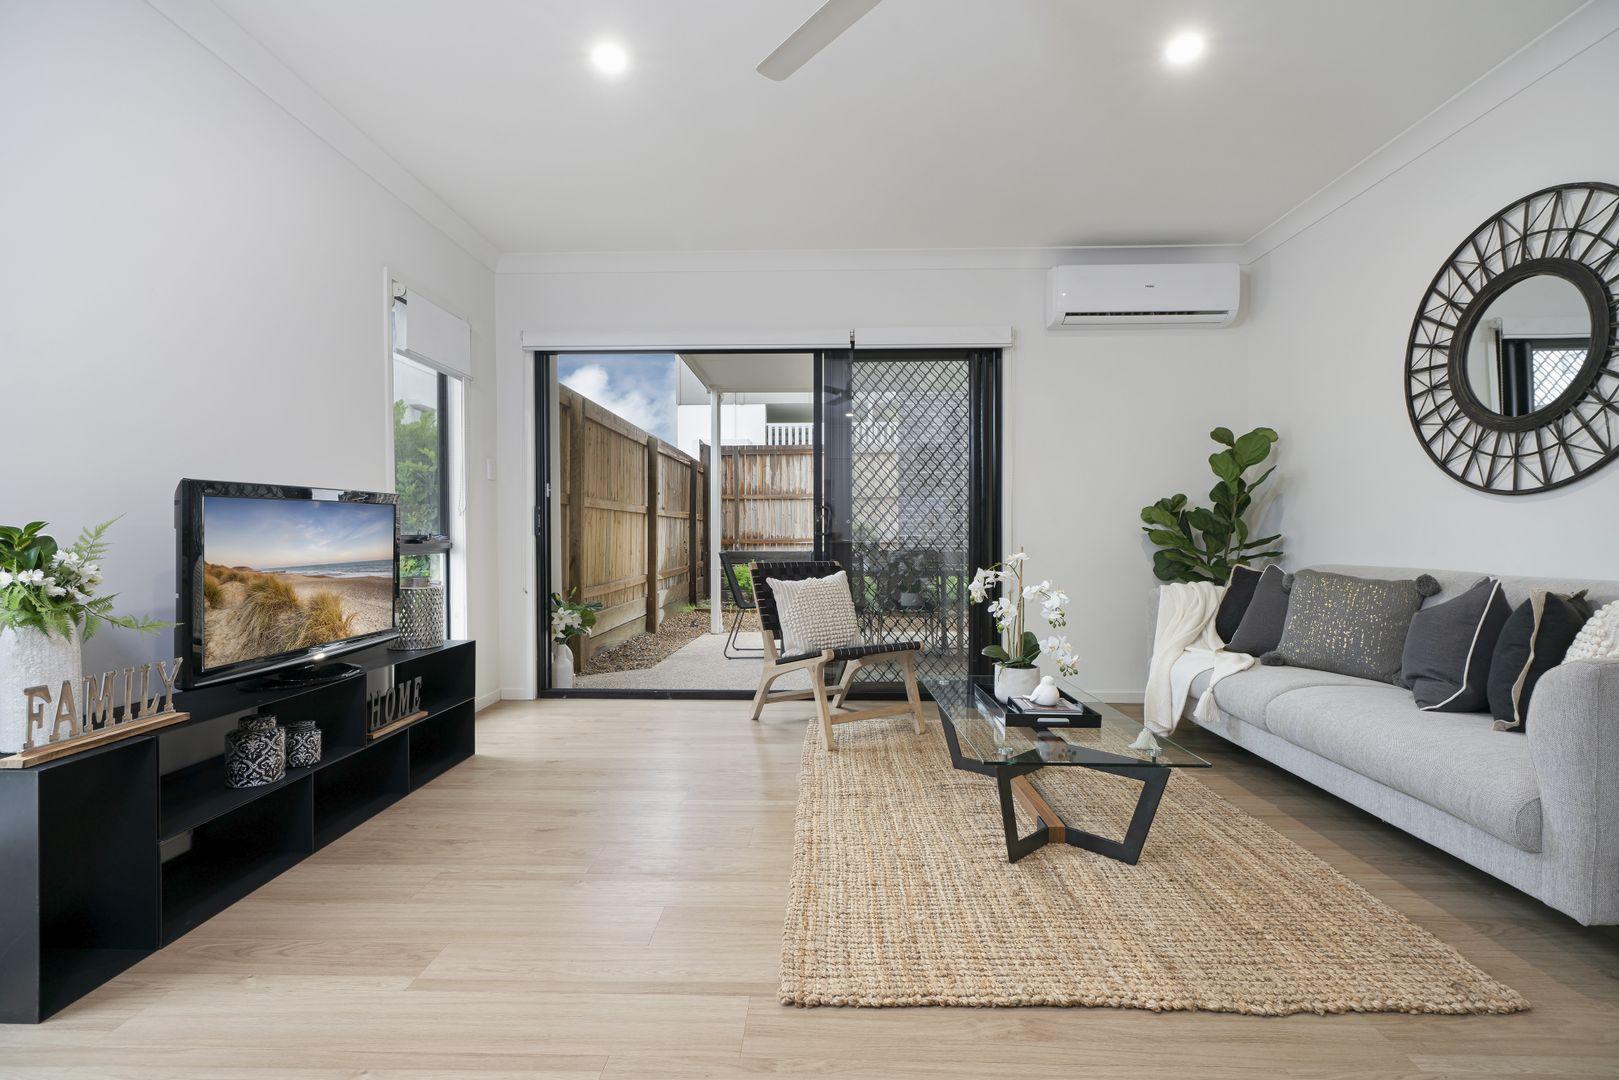 142/7 Giosam  Street, Richlands QLD 4077, Image 0